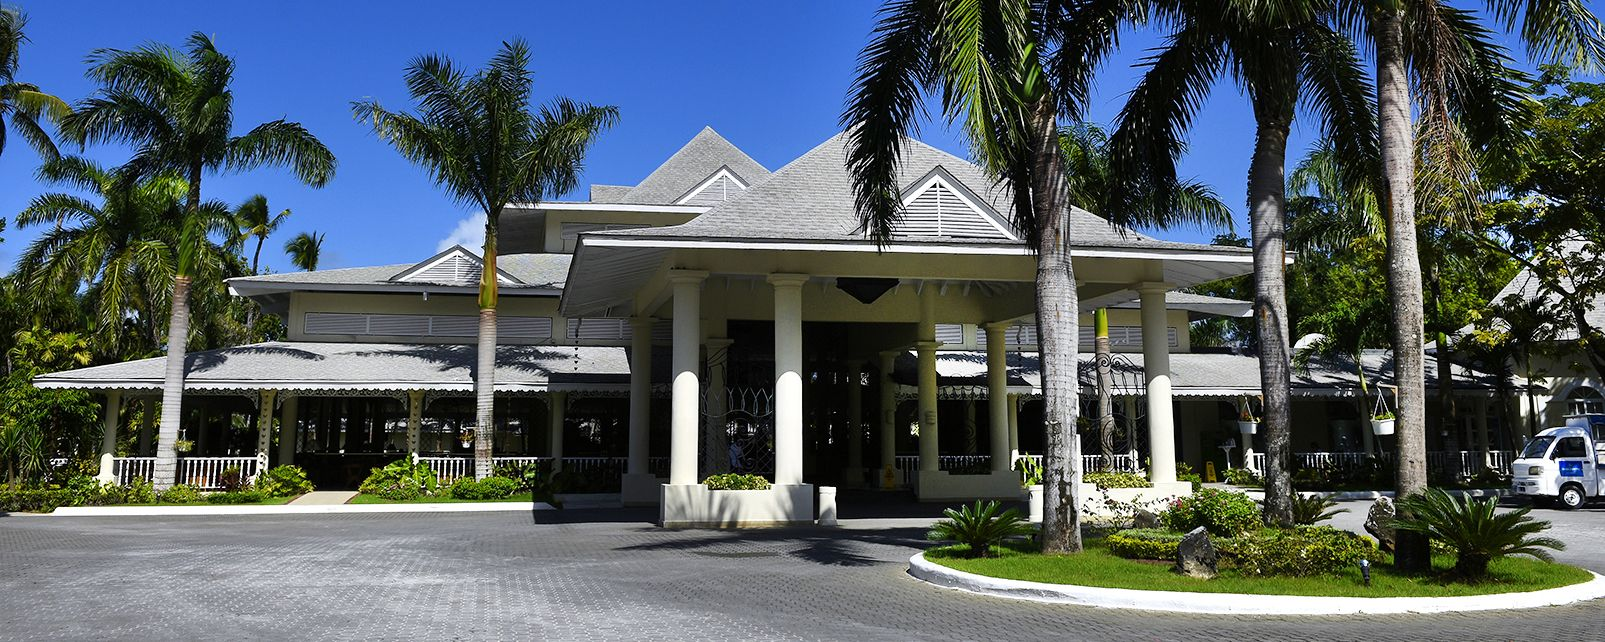 Hôtel Grand Bahia Principe El Portillo